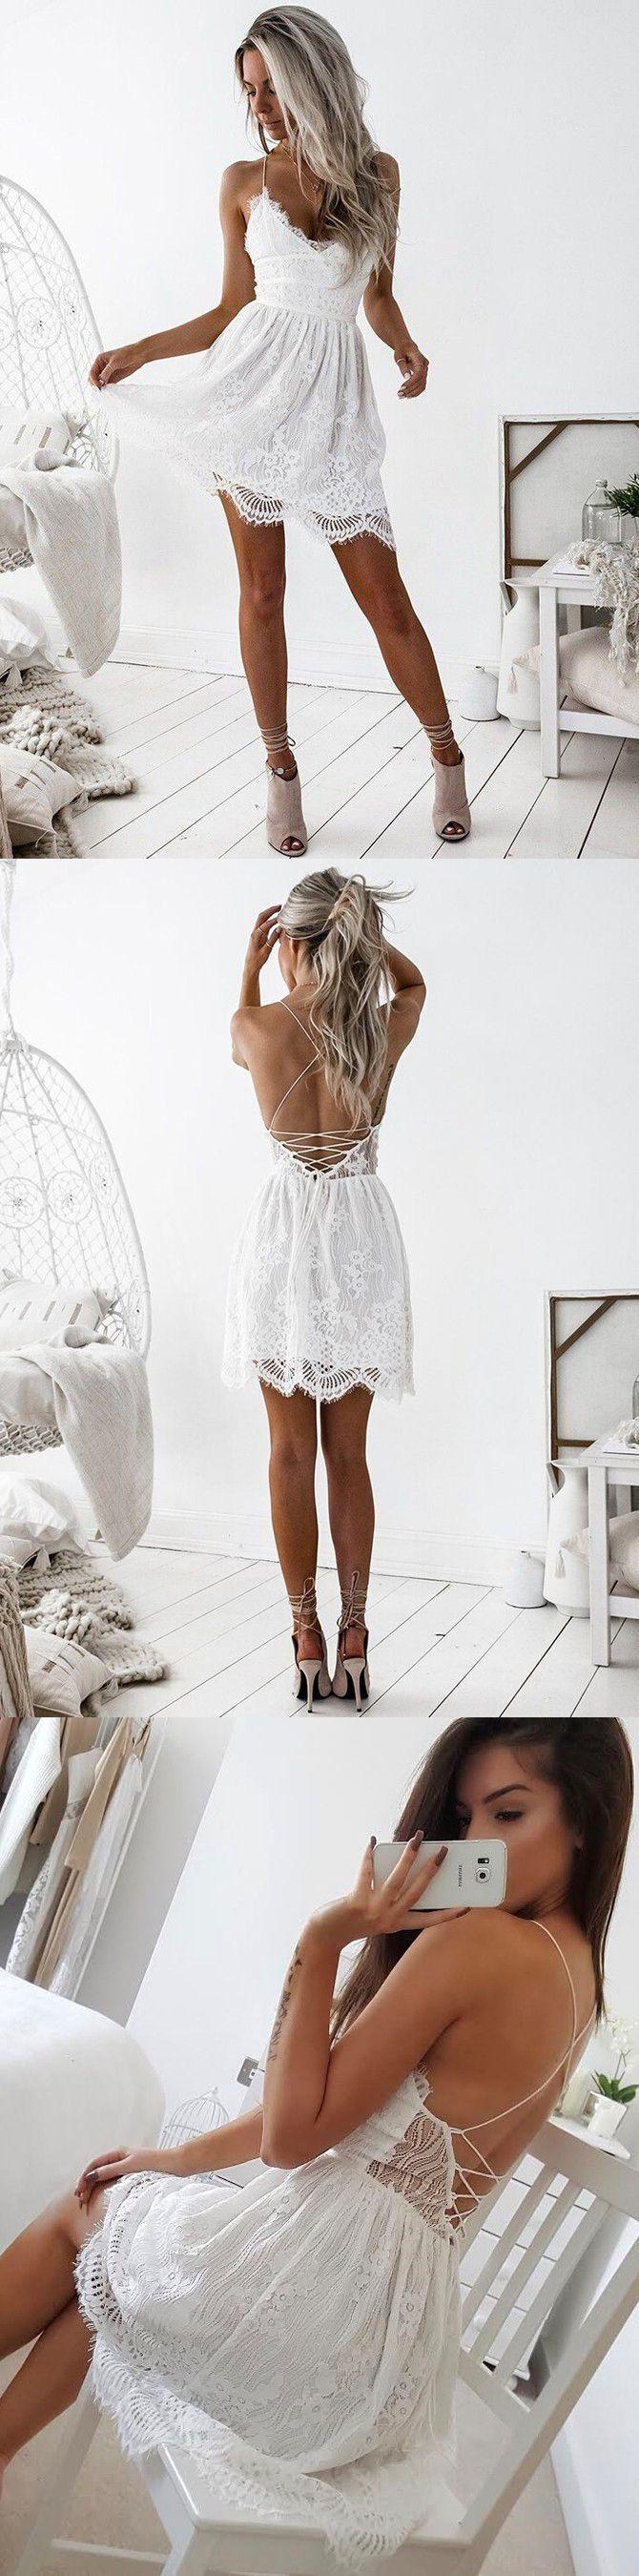 homecoming dresses,short homecoming dresses,cheap homecoming dresses,white homecoming dresses,lace homecoming dresses,